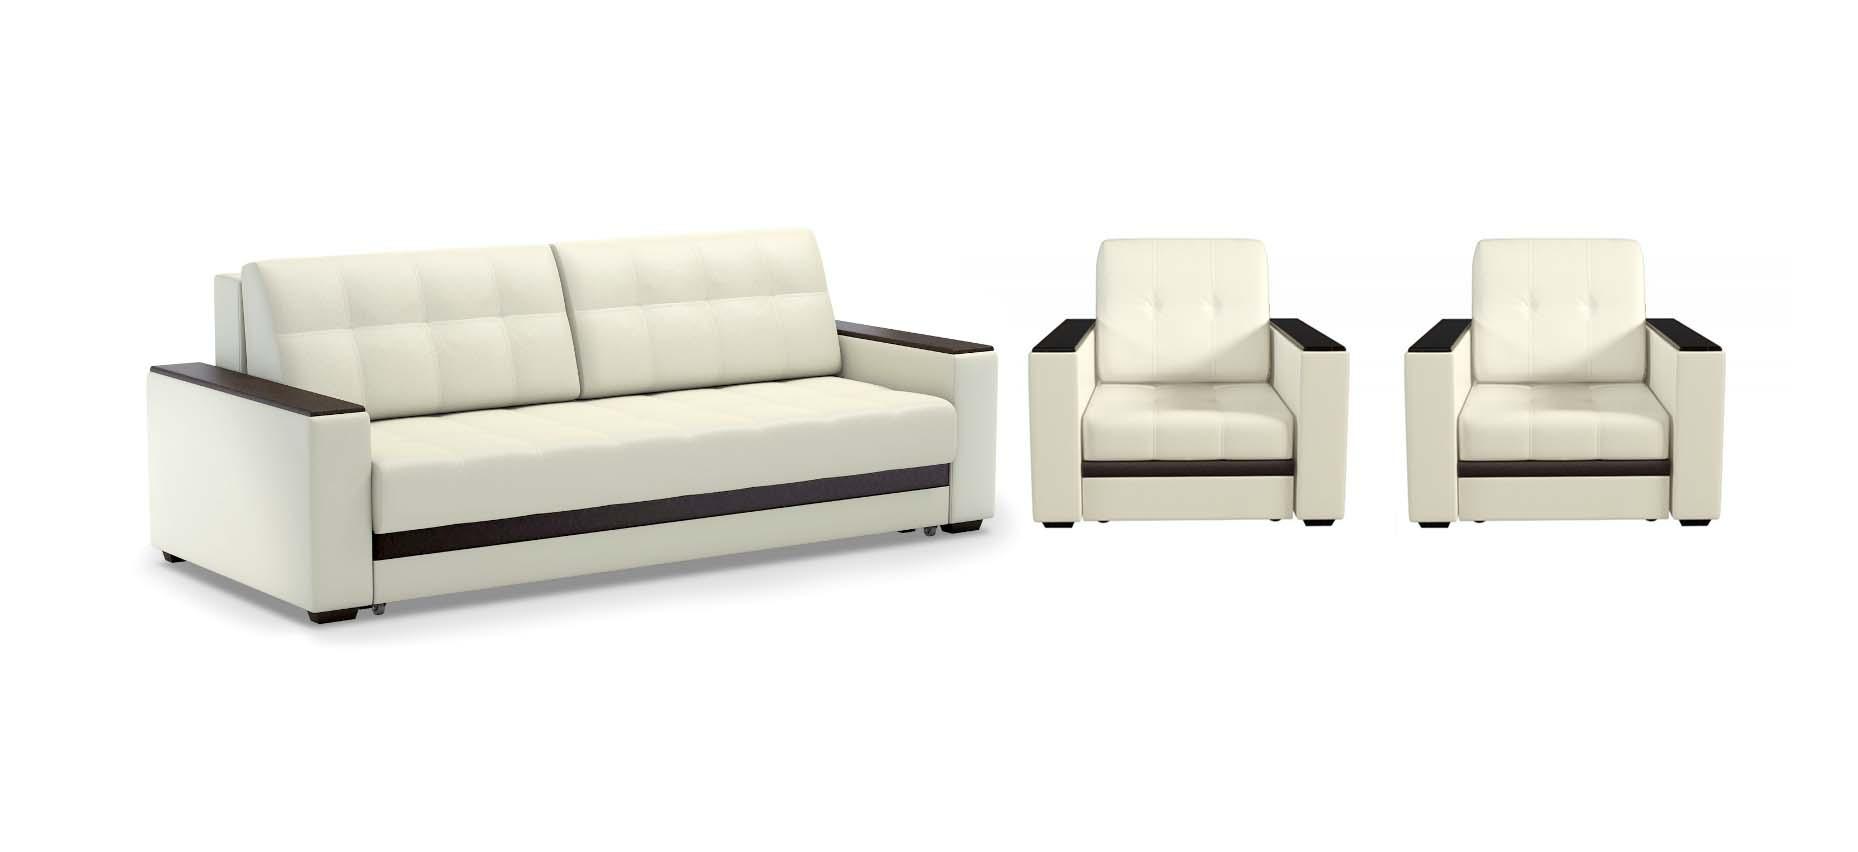 Комплект мягкой мебели Атланта Sofa